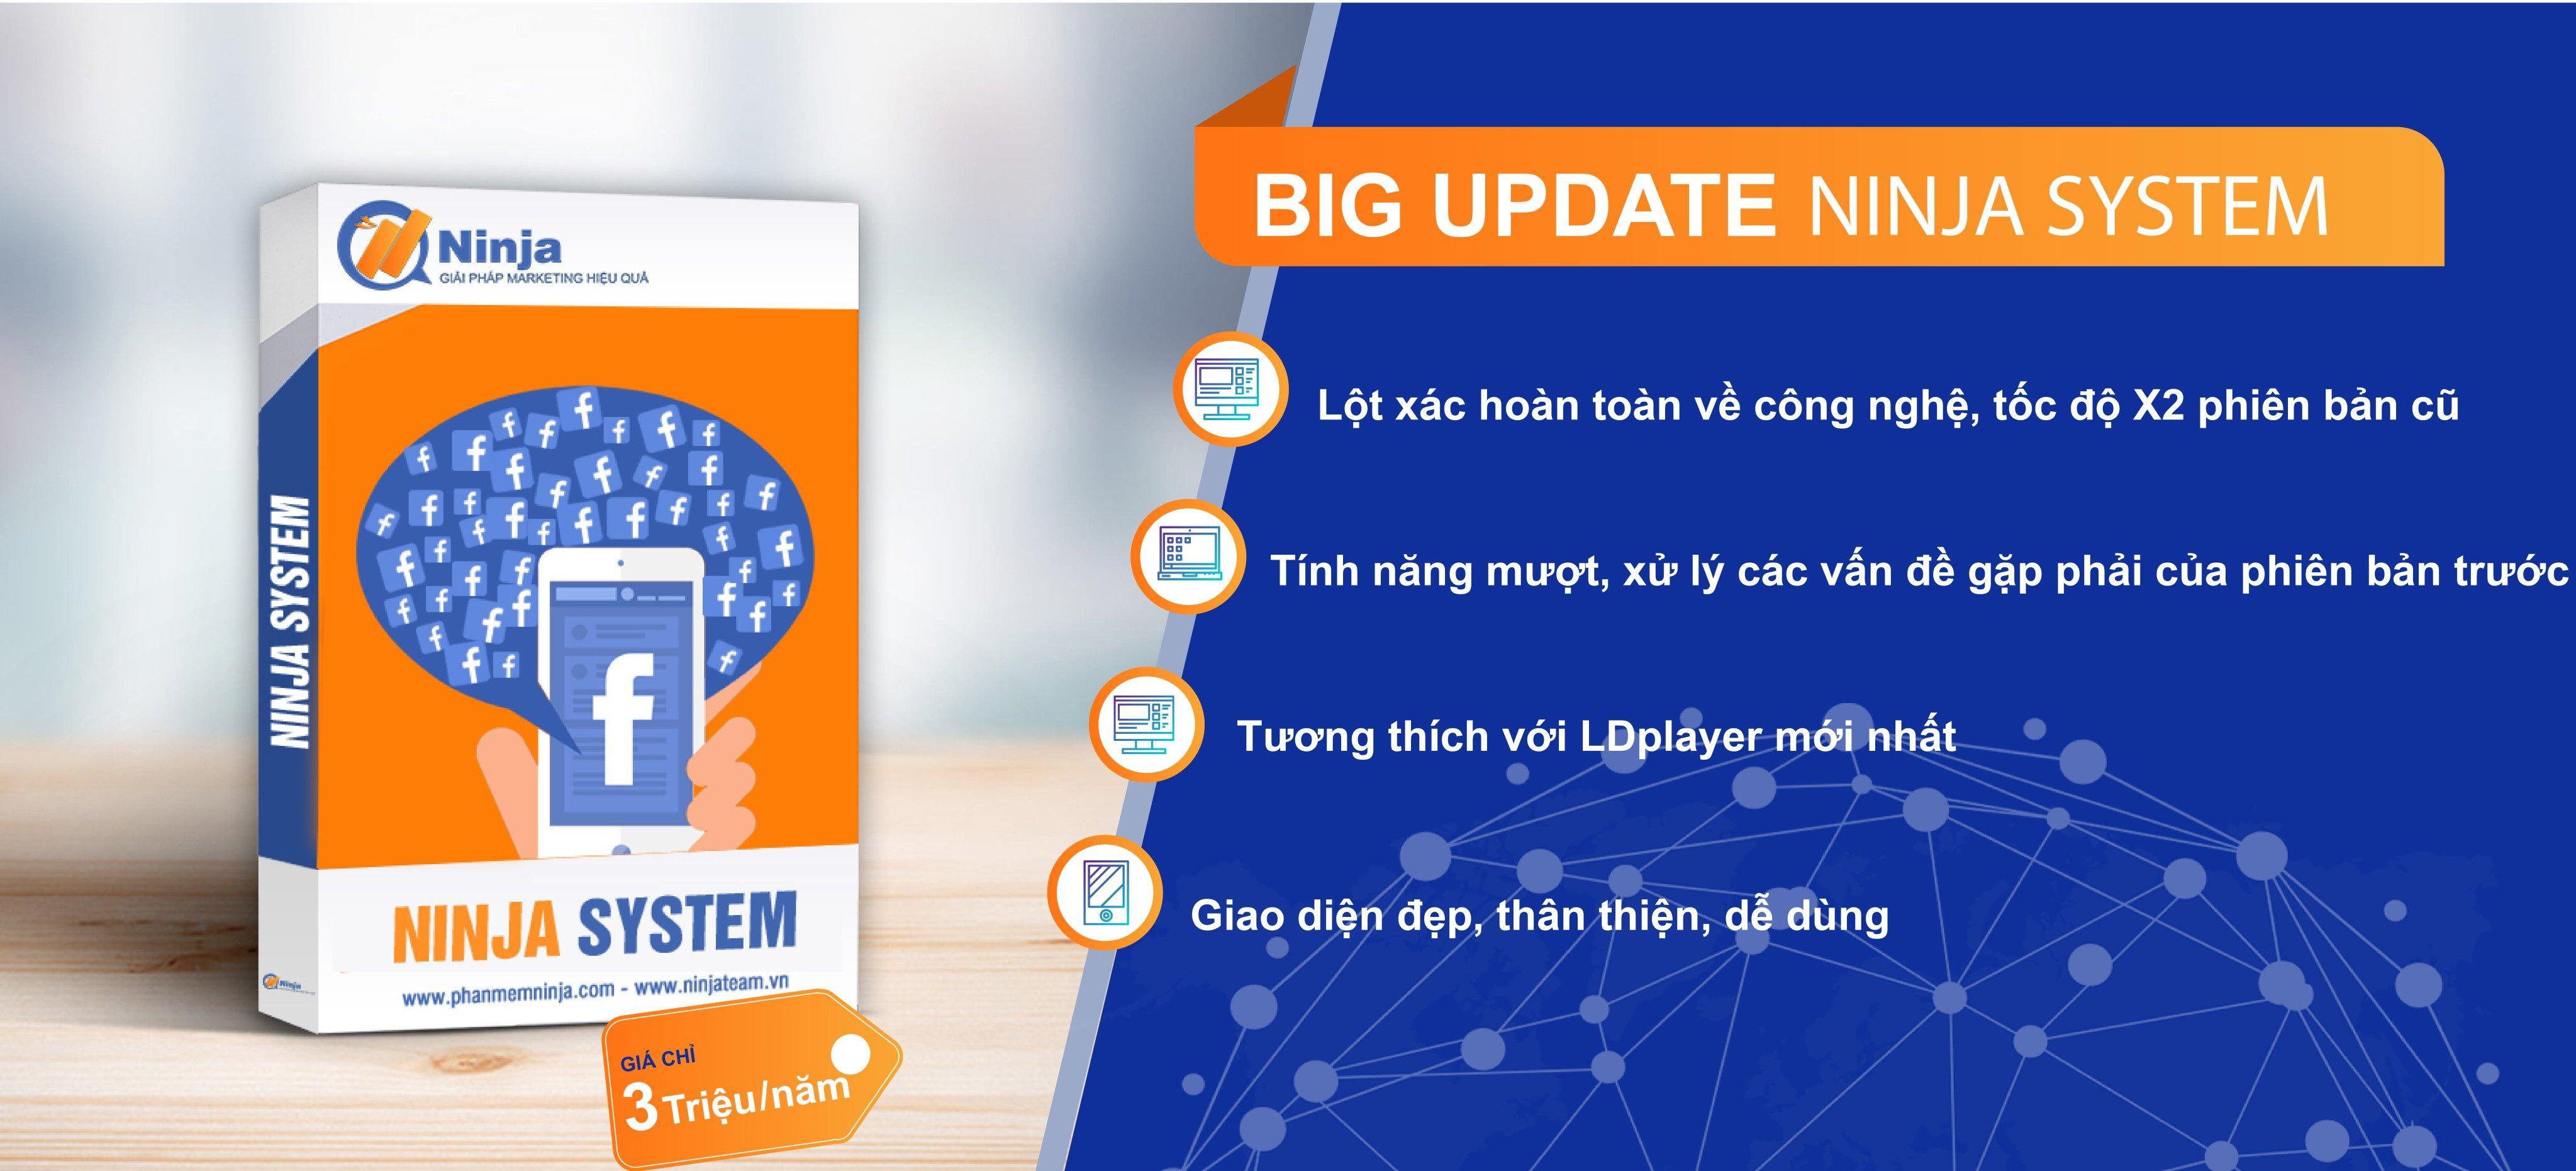 ninjasystem.v4 Cập nhật phần mềm nuôi nick giả lập Ninja System V4 version 2.3